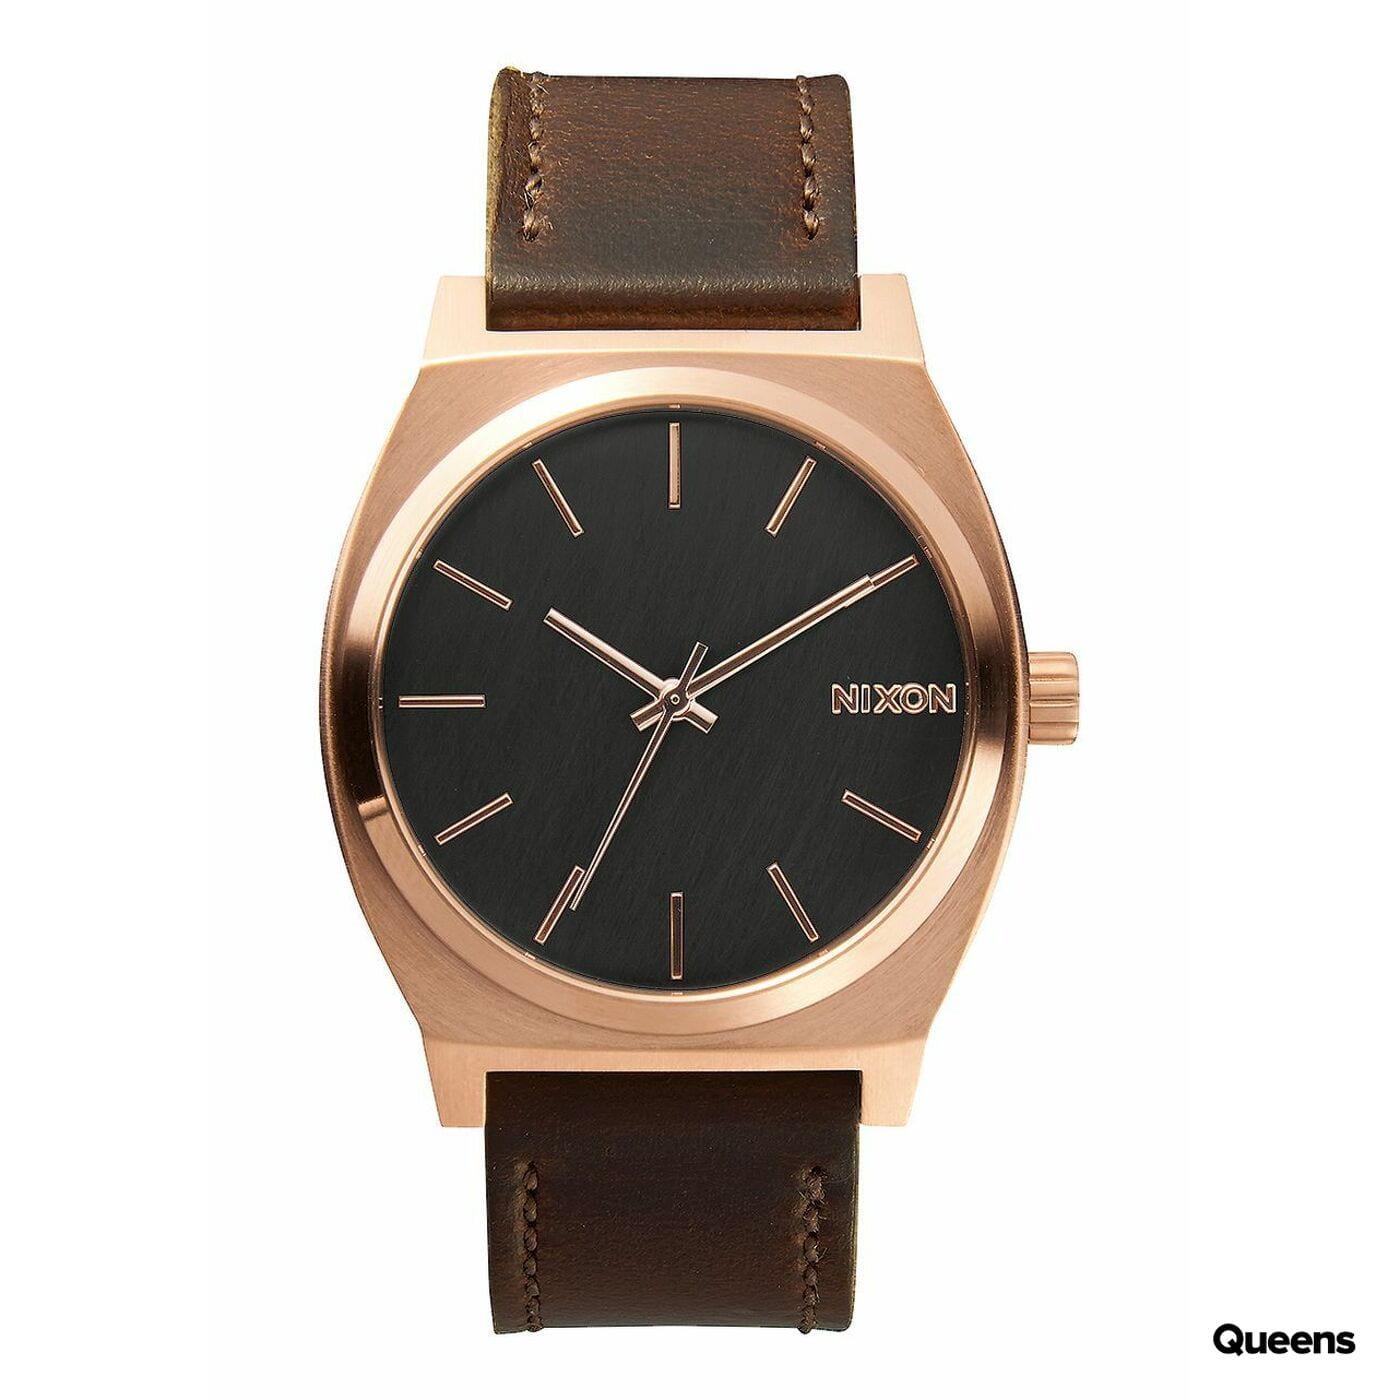 Nixon Time Teller hnedé / bronzové / čierne